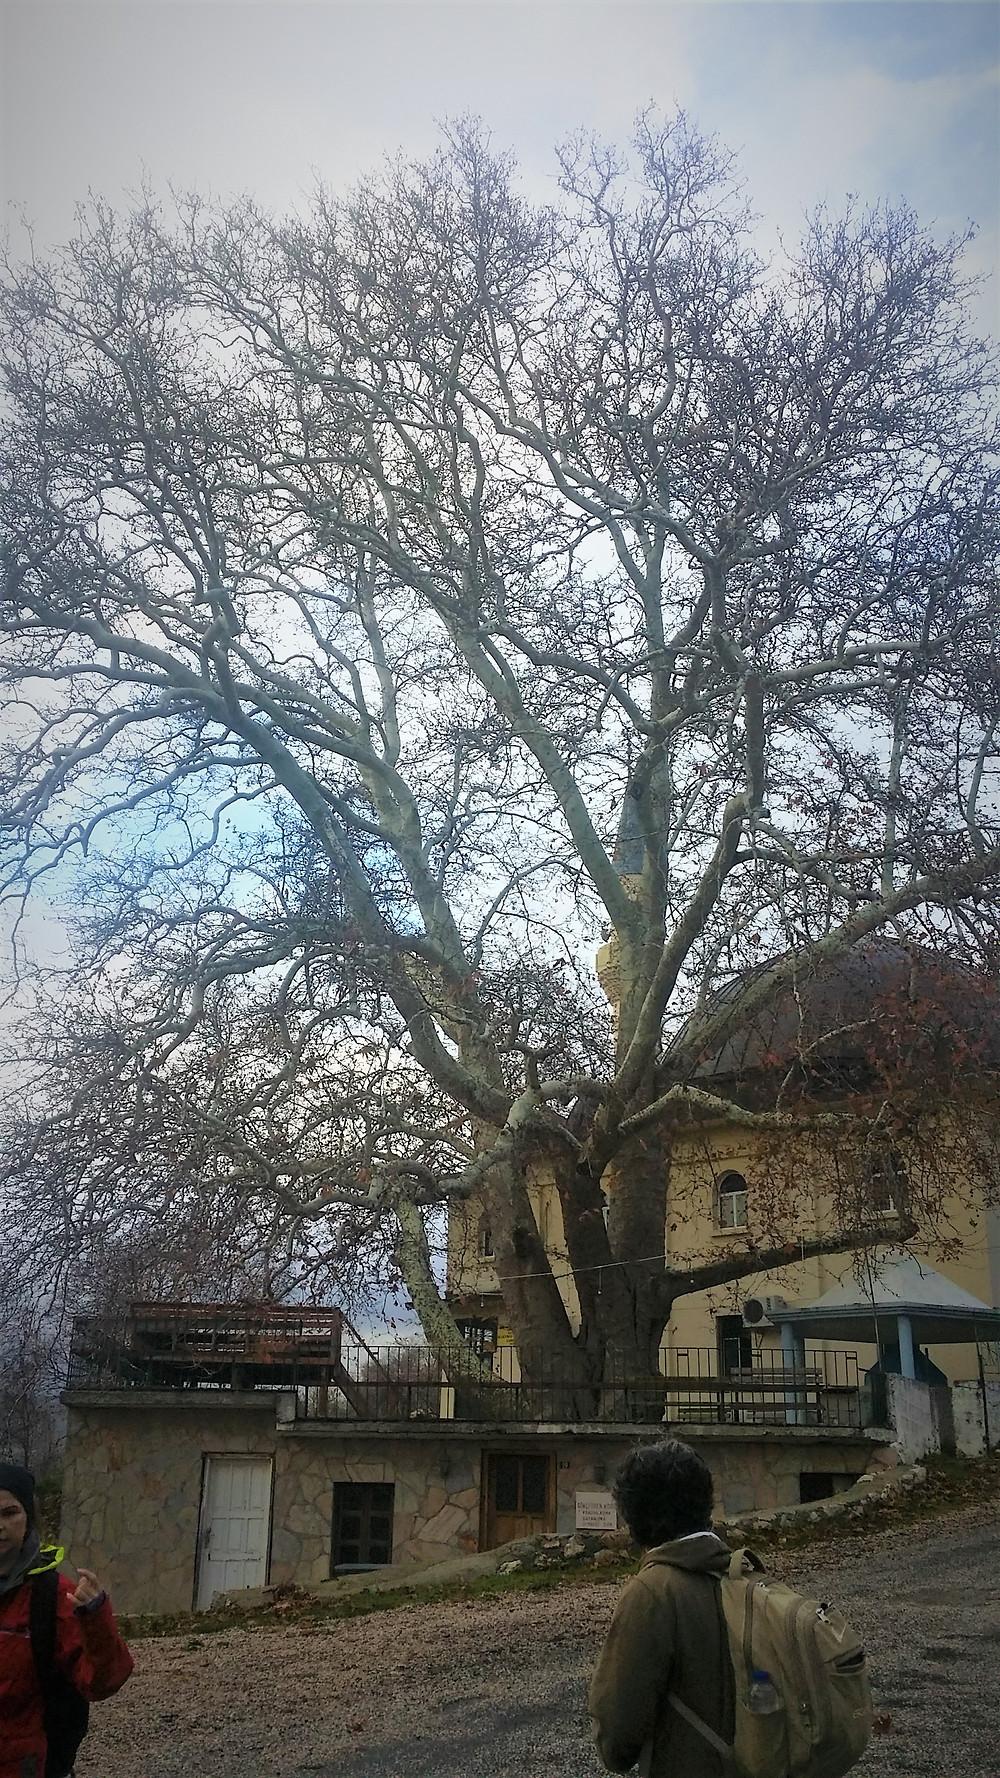 Plane tree in Gokceoren, Lycia